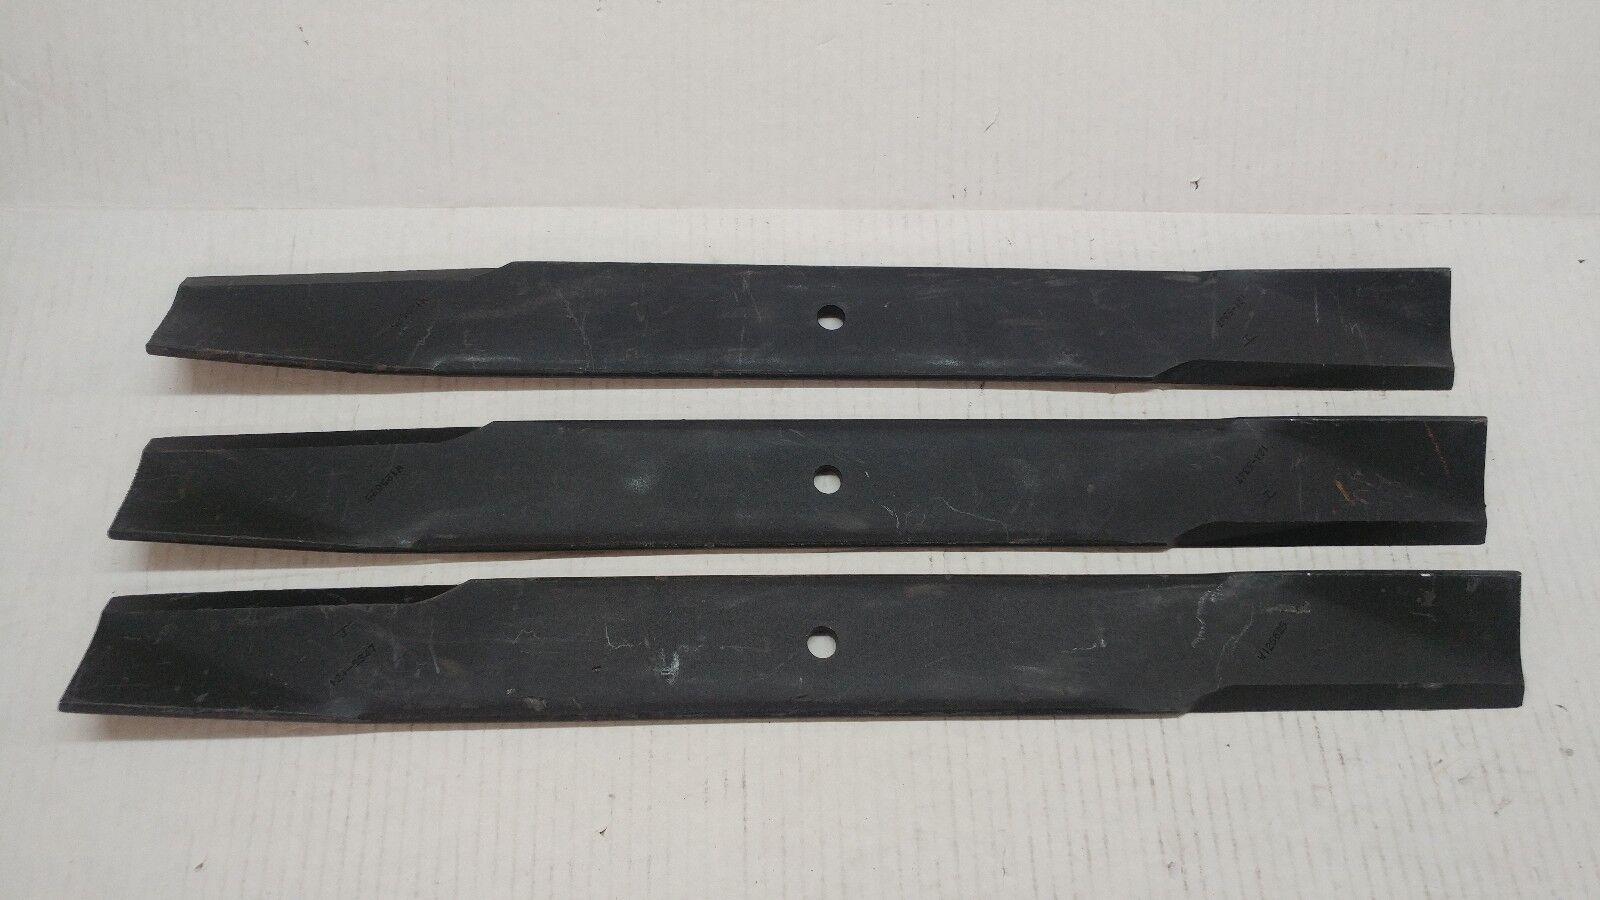 Qty-3 25-3 16  Toro, de 121-5347, Med-lift Blade para 72  rojoondo y Guardian Cubierta